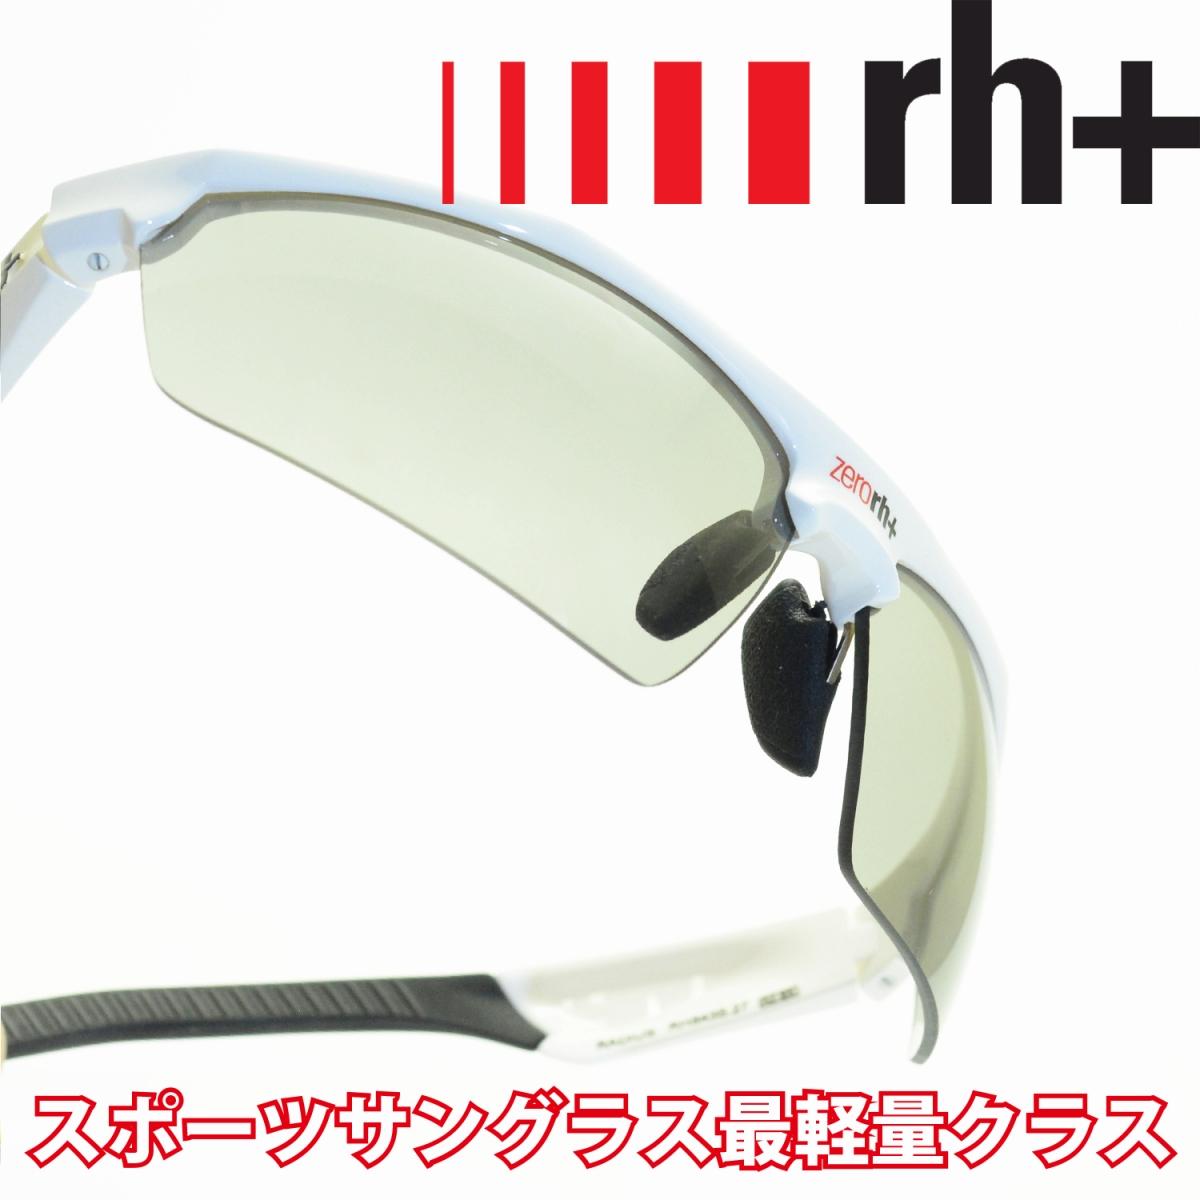 rh+ アールエイチプラス RADIUS RH843S27メガネ 眼鏡 めがね メンズ レディース おしゃれ ブランド 人気 おすすめ フレーム 流行り 度付き レンズ サングラス スポーツ